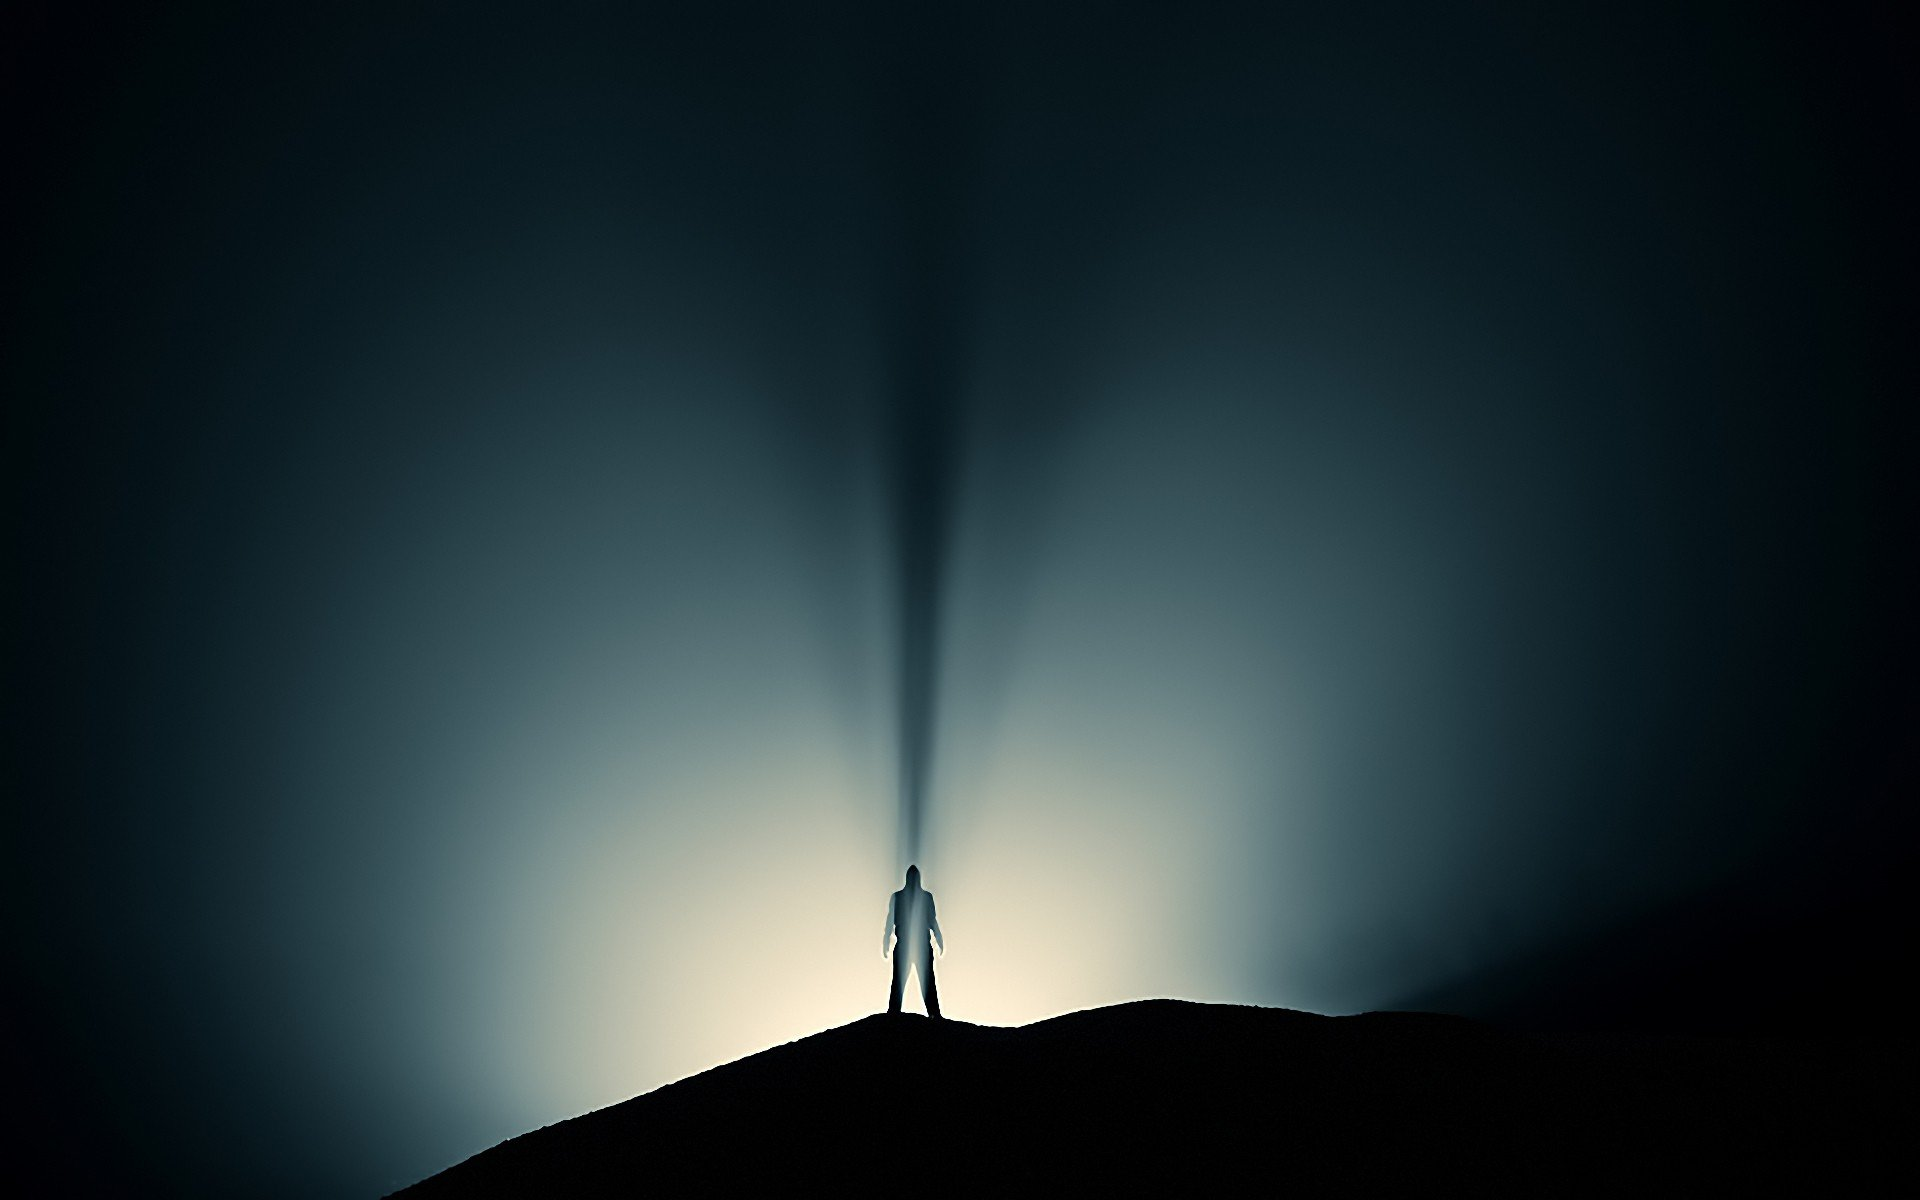 Lights Shadow Hills Photography Wallpapers Hd Desktop